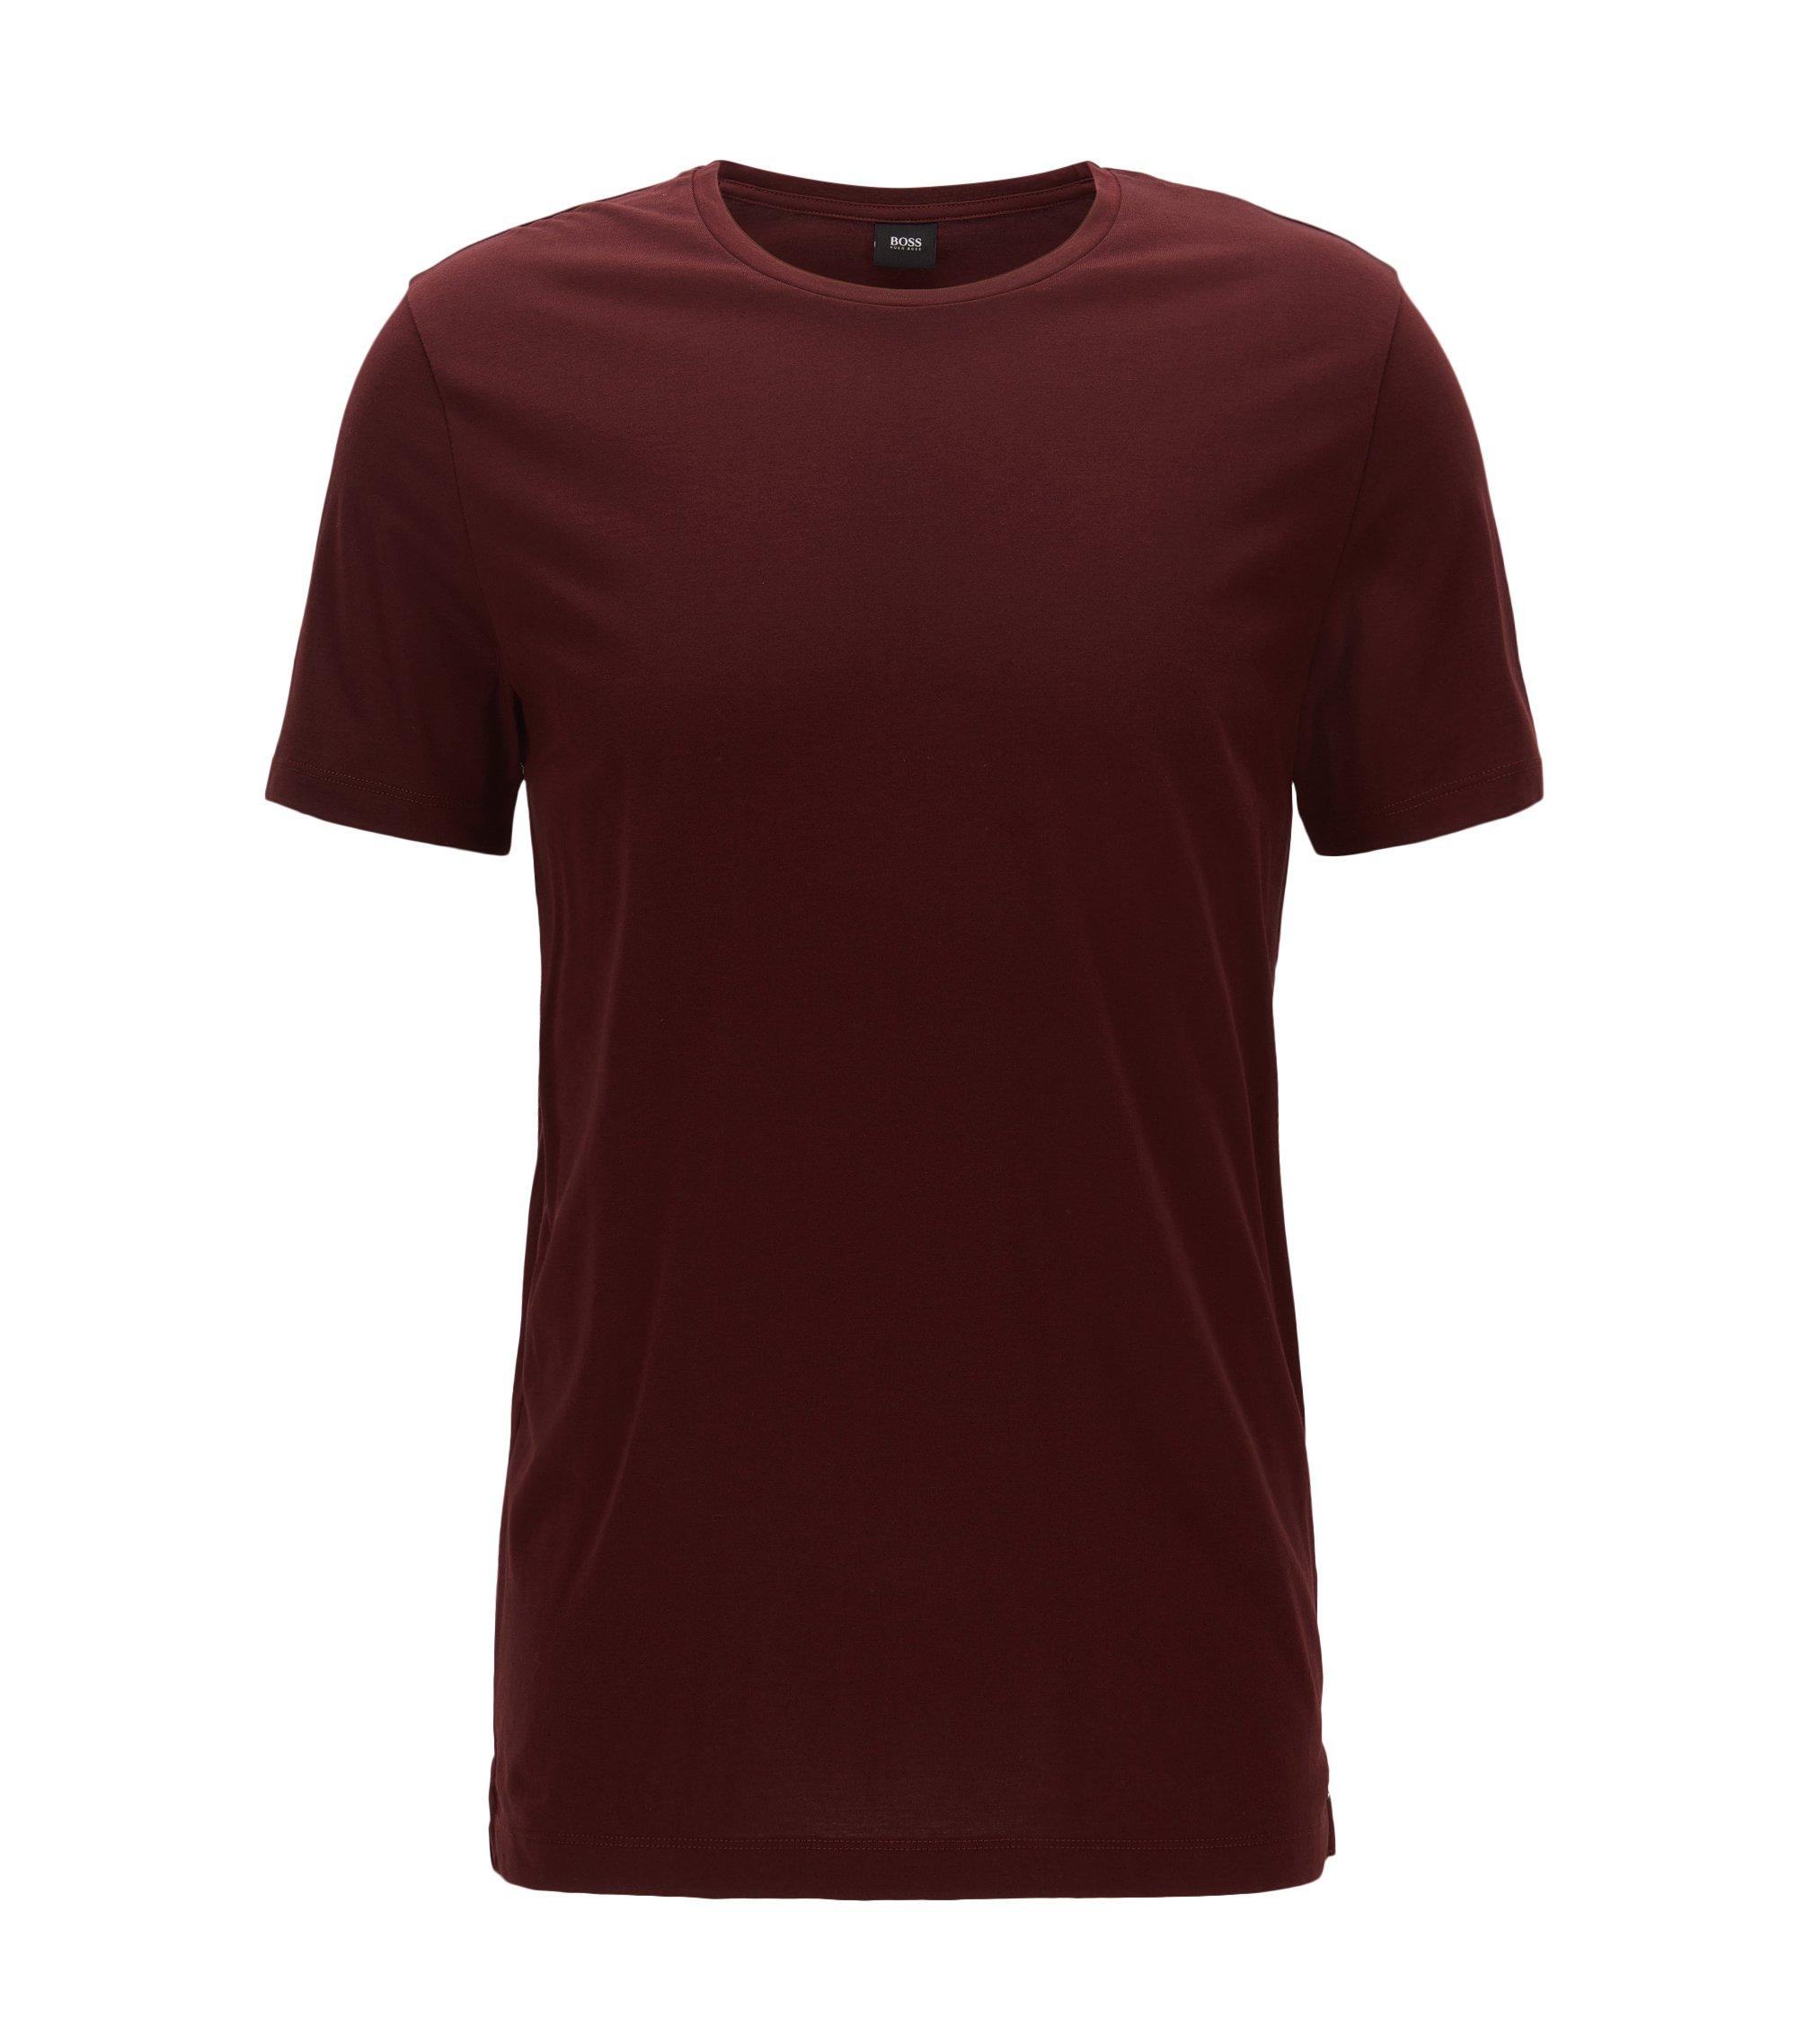 Slim-fit T-shirt in soft cotton jersey, Dark Red